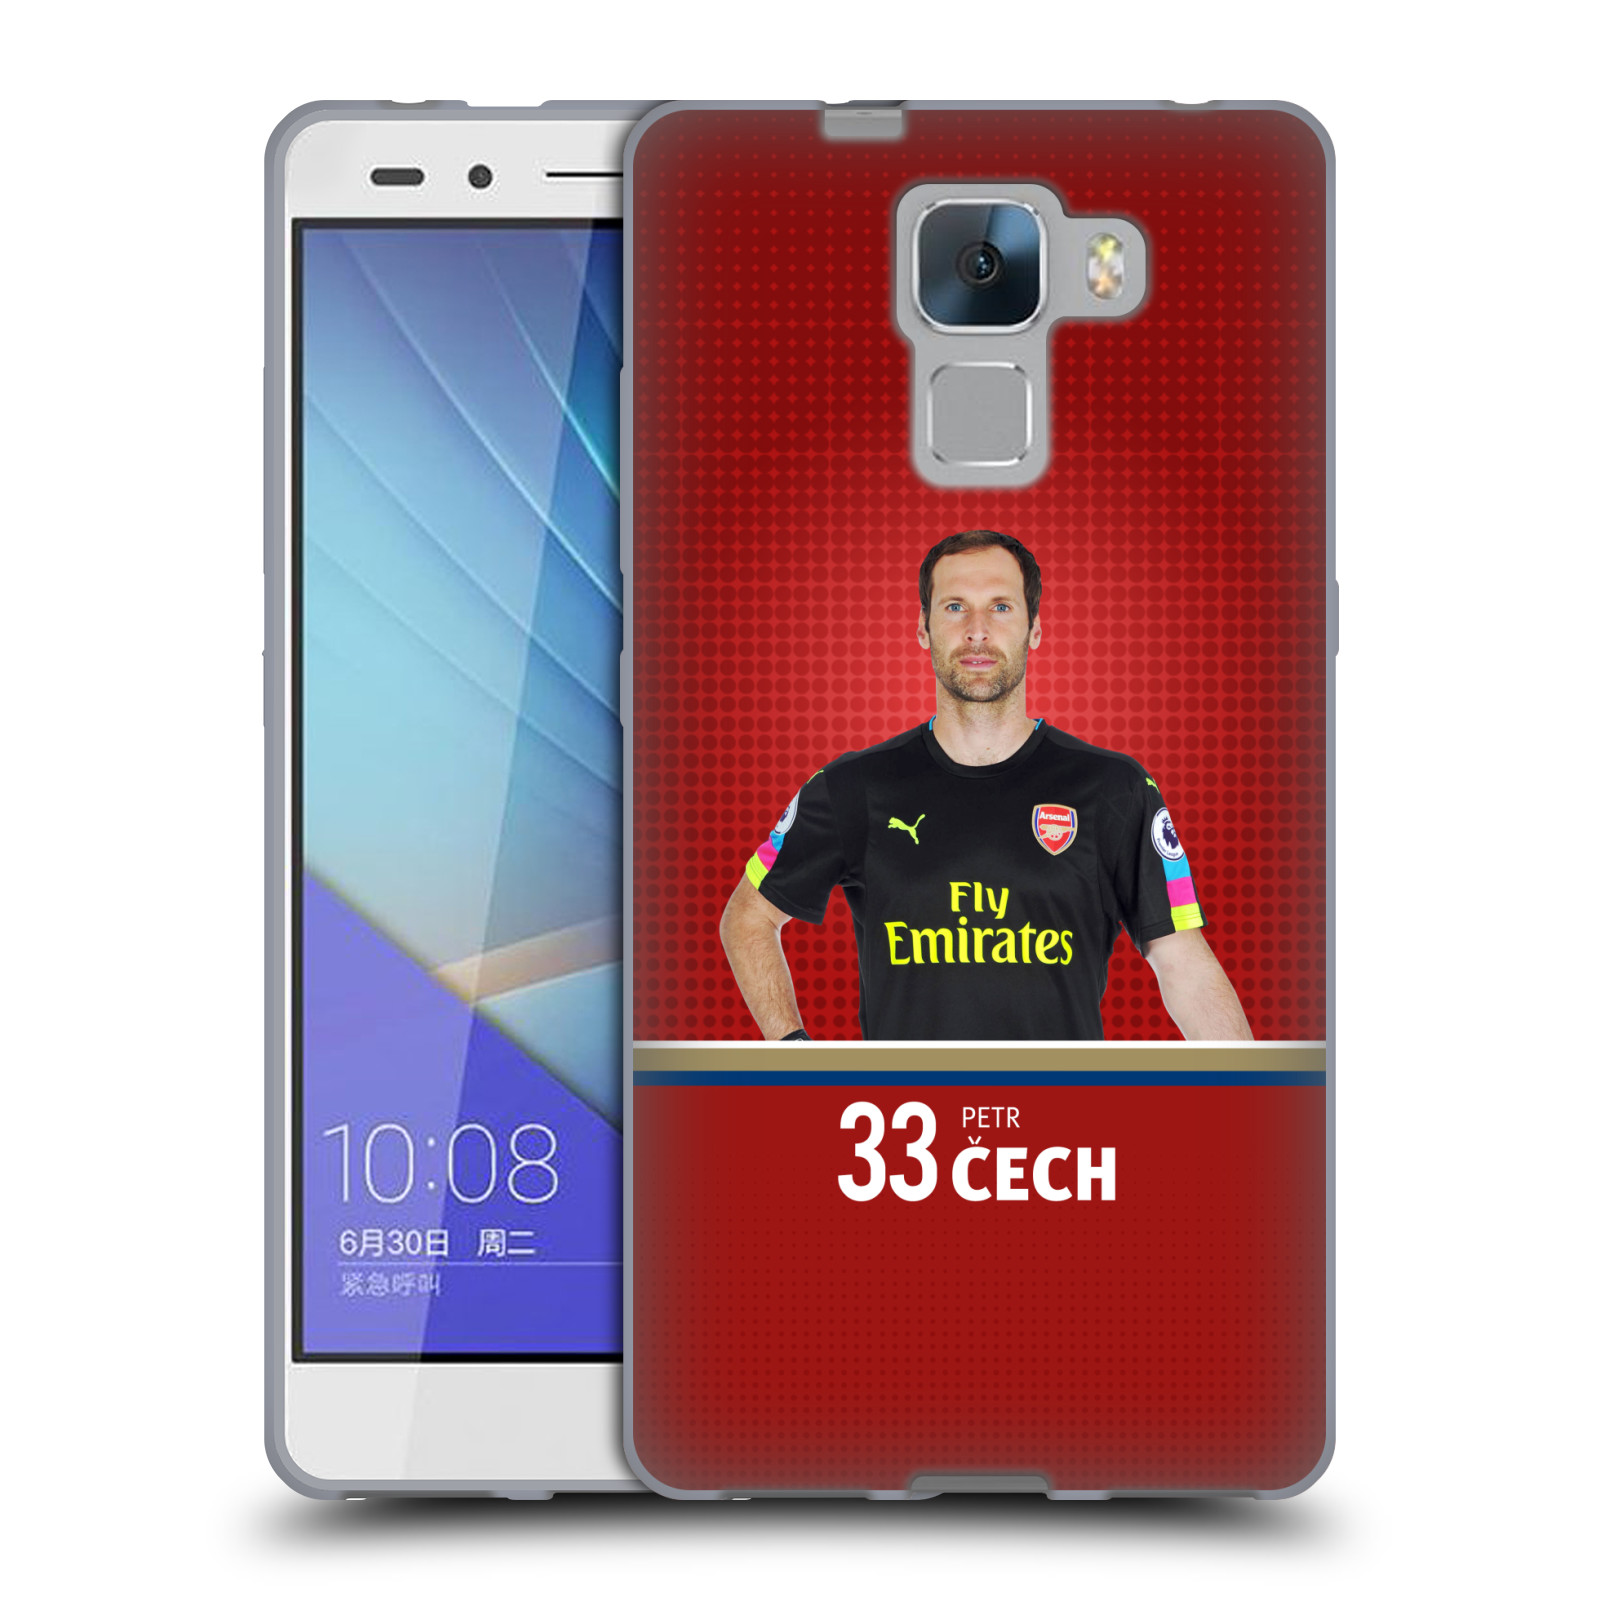 Silikonové pouzdro na mobil Honor 7 - Head Case - Arsenal FC - Petr Čech